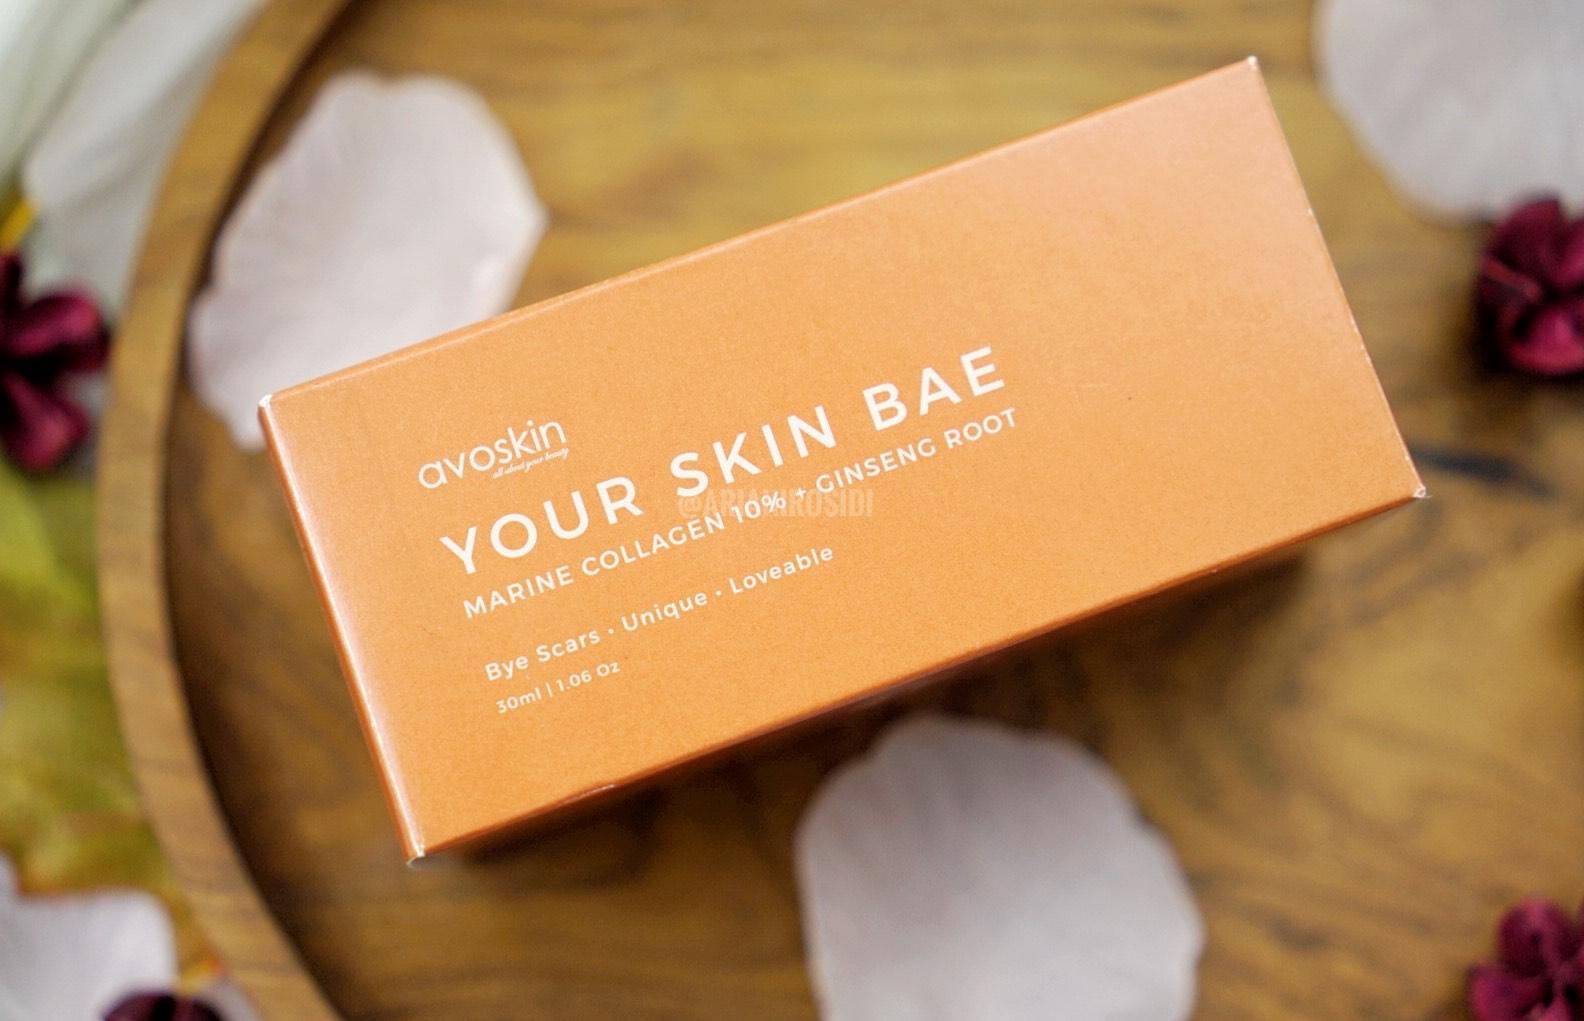 Avoskin Your Skin Bae Niacinamide 7% + Alpha Arbutin 1% + Kale dan Marine Collagen 10% + Ginseng Root Review